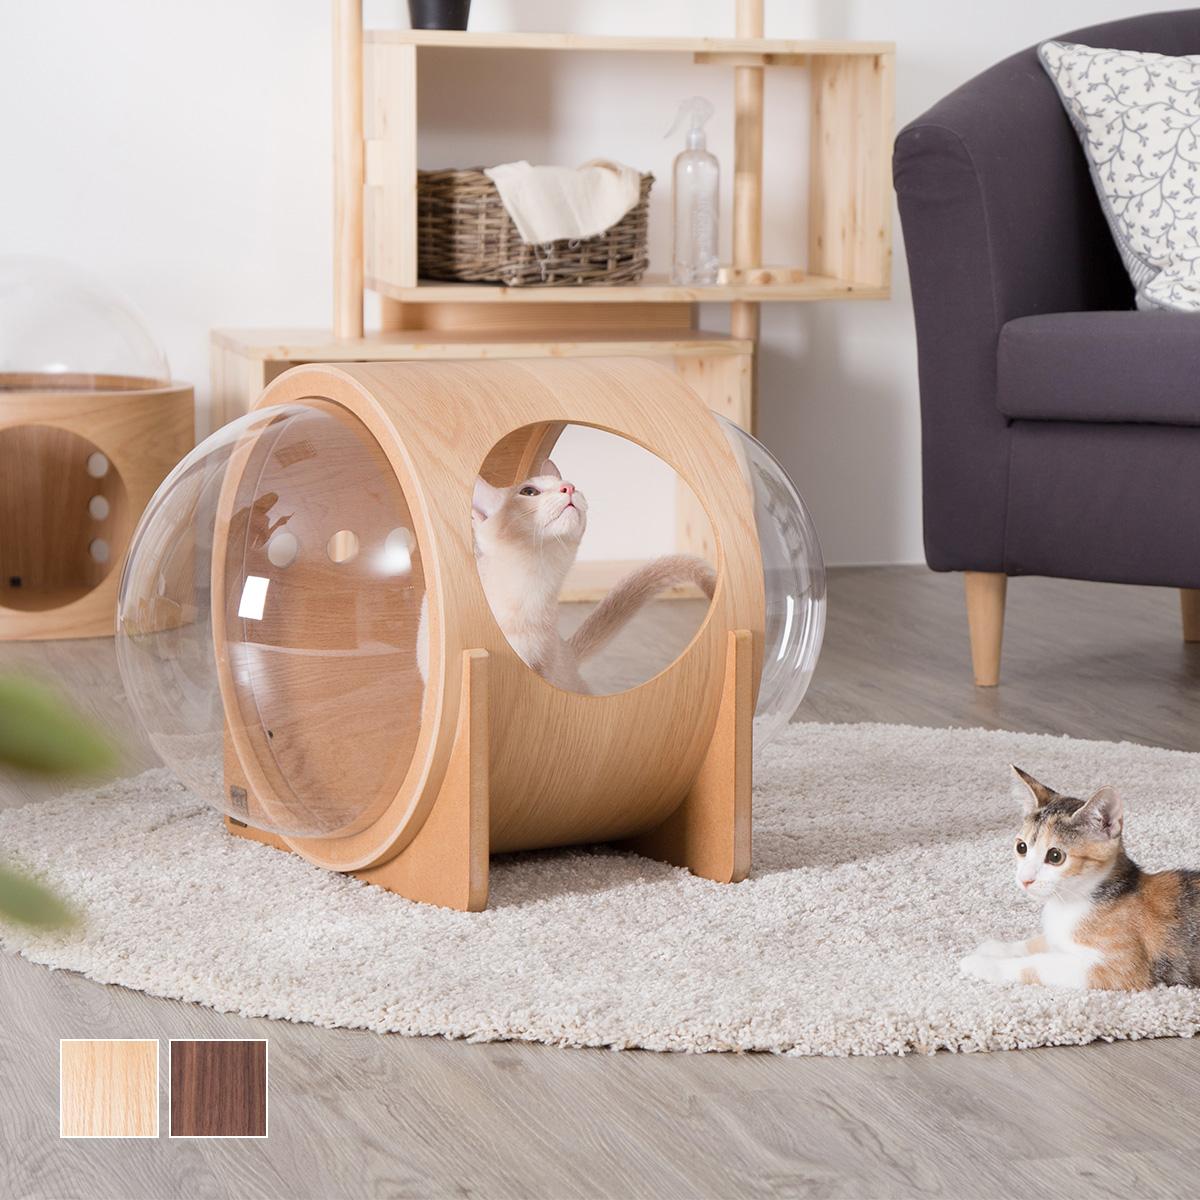 my zoo 猫ハウス 猫 ベッド 木製 猫家具 ねこ ネコ かわいい おしゃれ[〈MYZOO マイズー〉宇宙船アルファ ネコハウス]